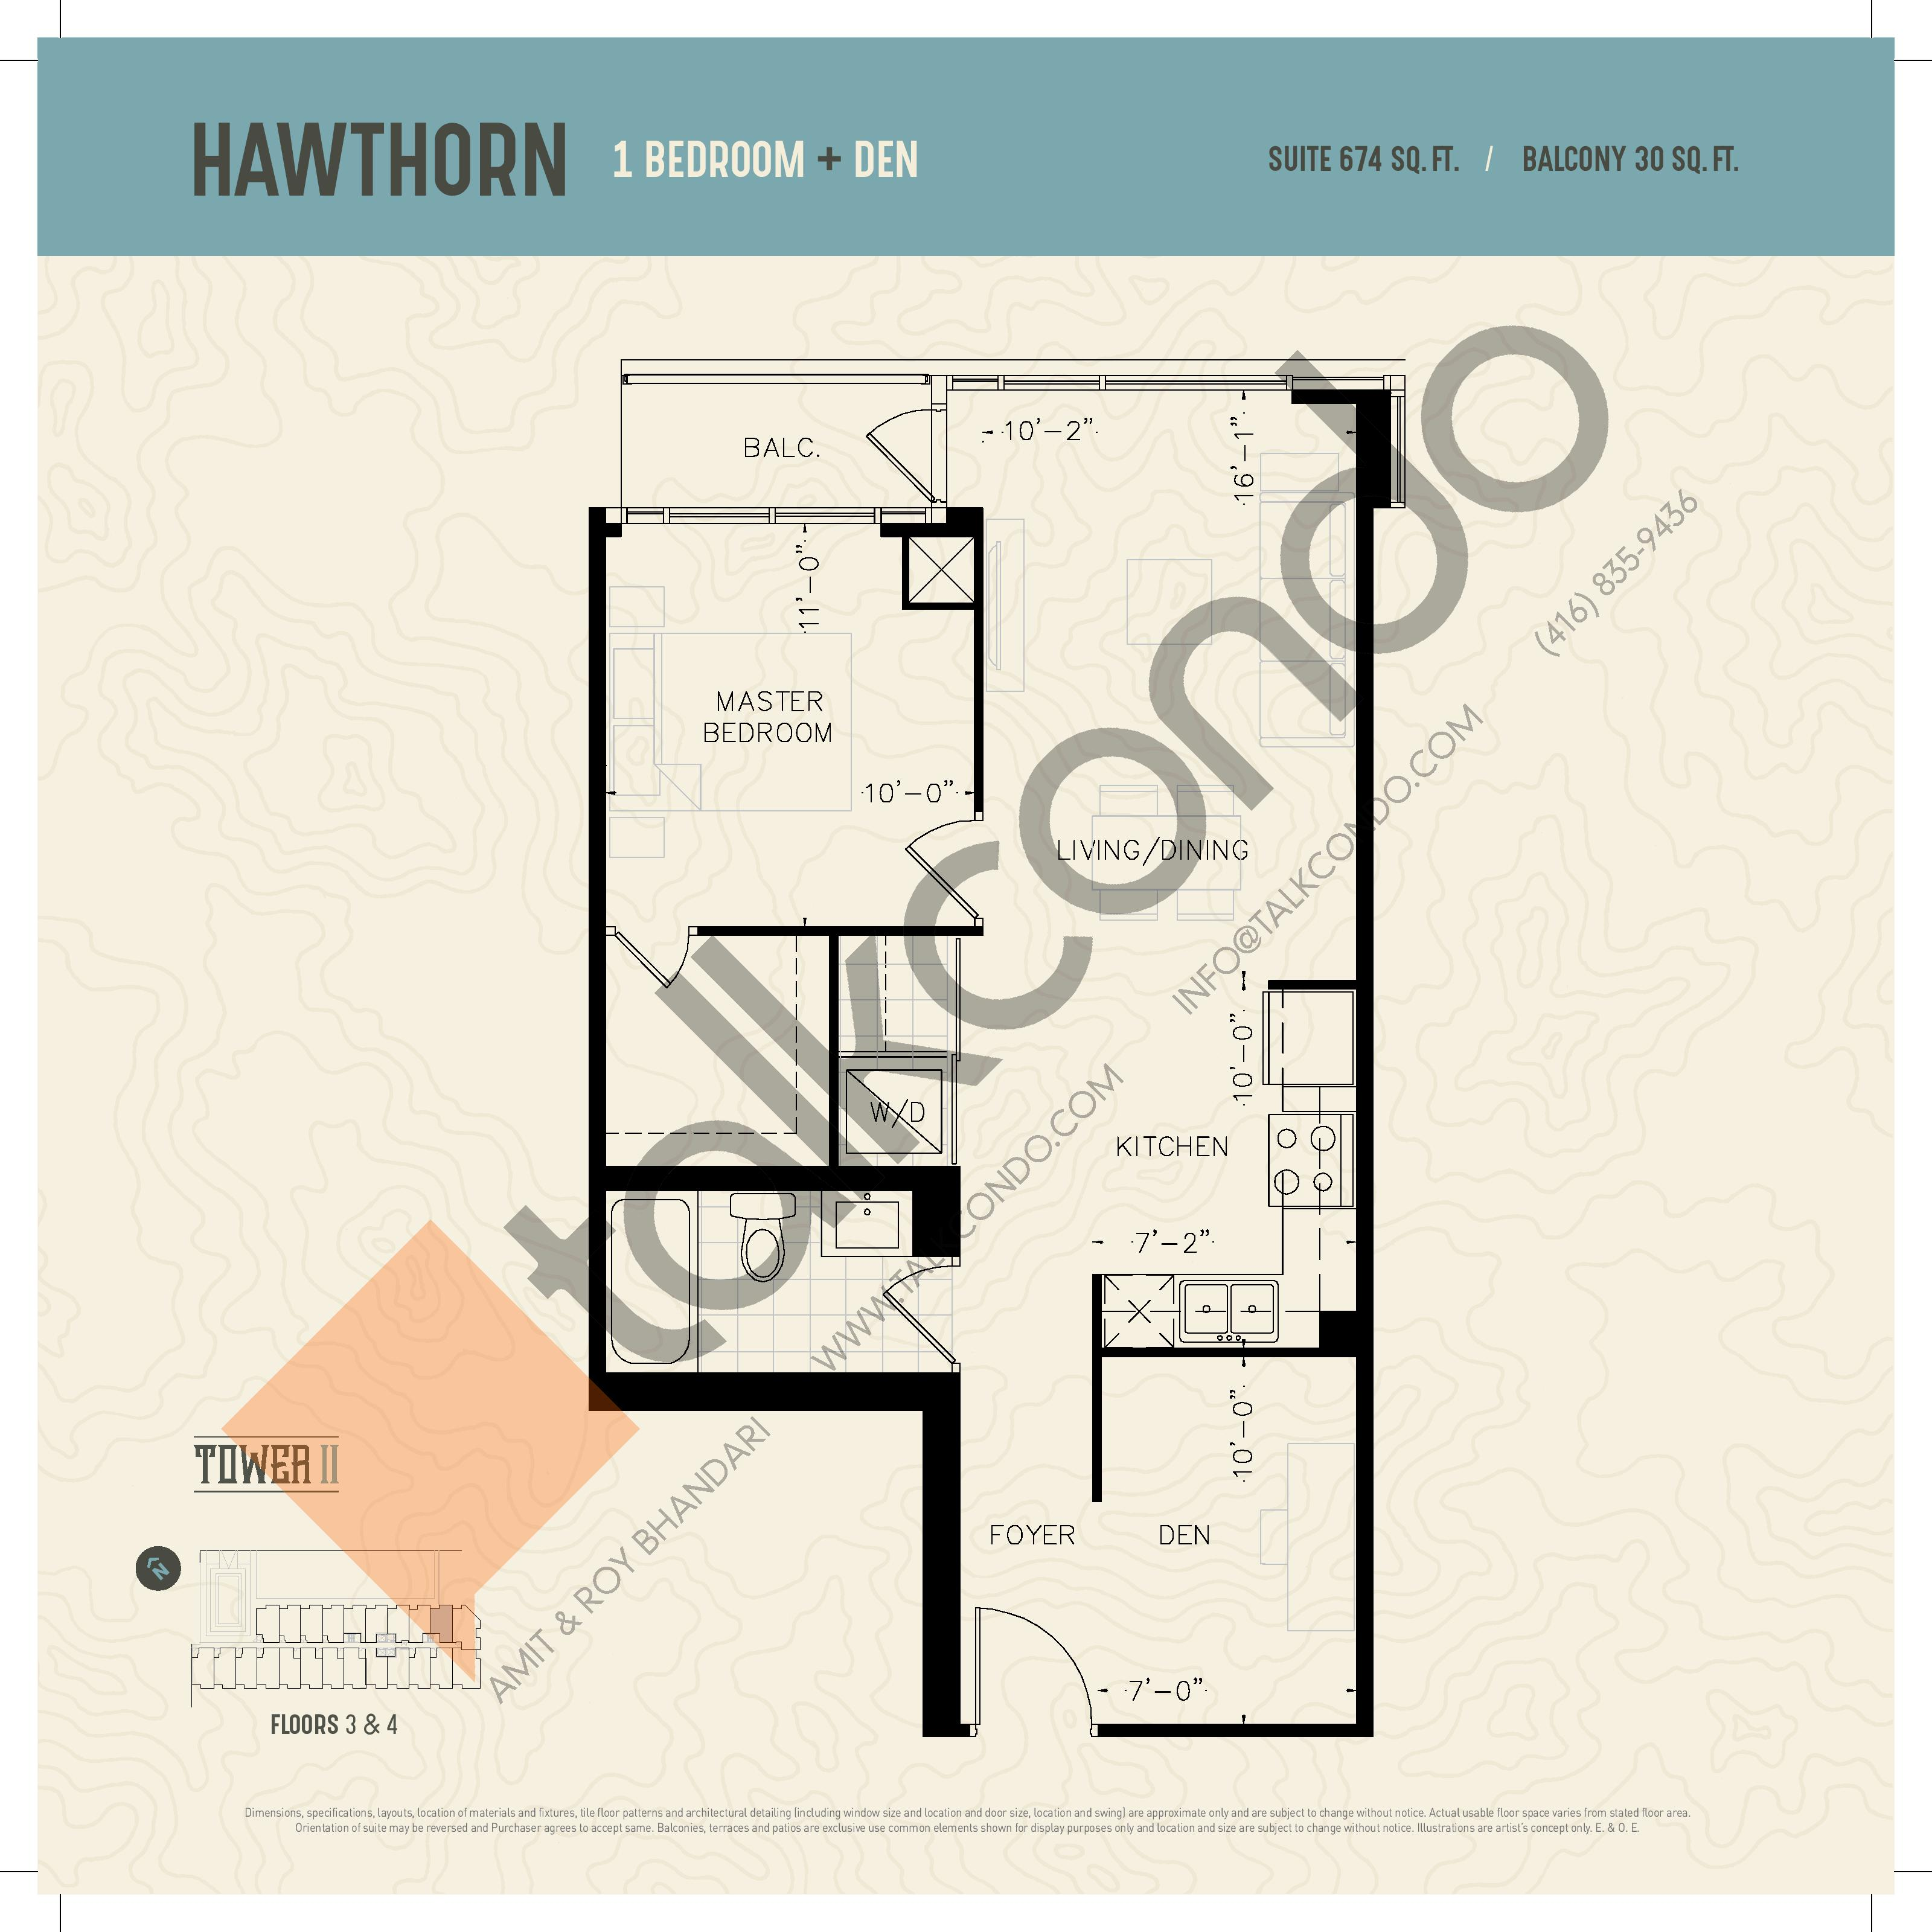 Hawthorn (Podium) Floor Plan at Oak & Co. 2 Condos - 674 sq.ft